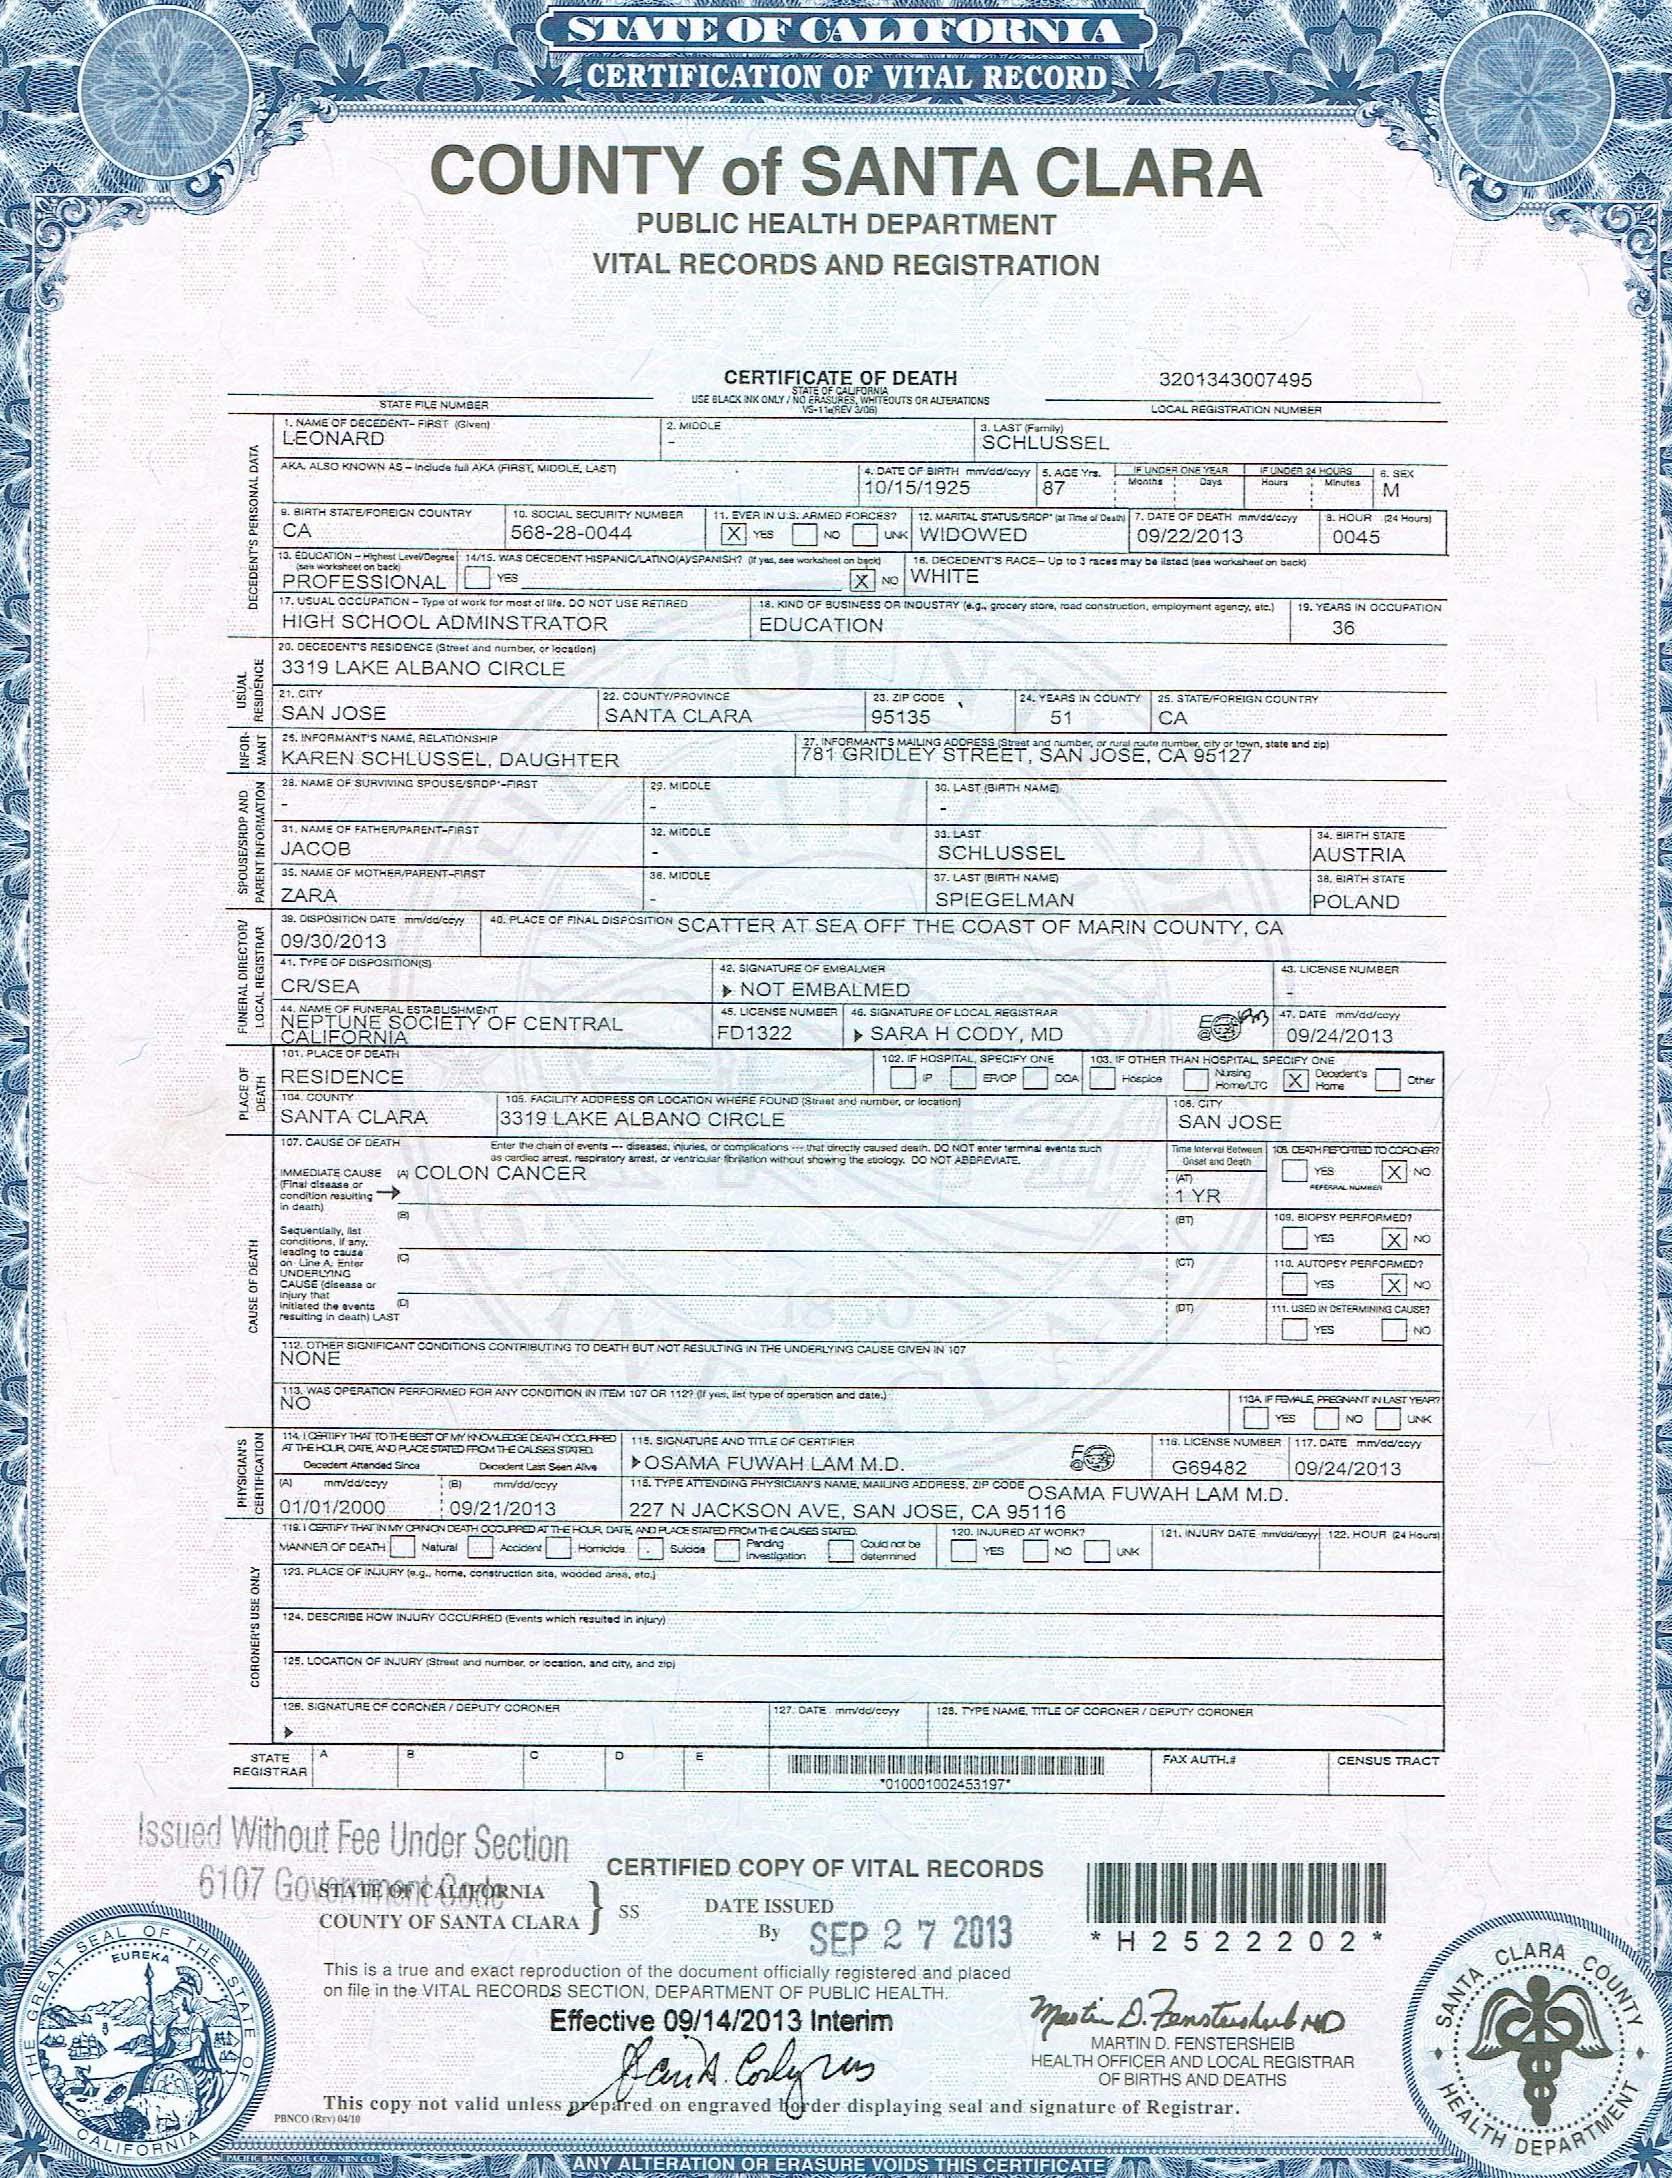 Schlussel family karens keys to genealogy click here to view leonards death certificate xflitez Gallery